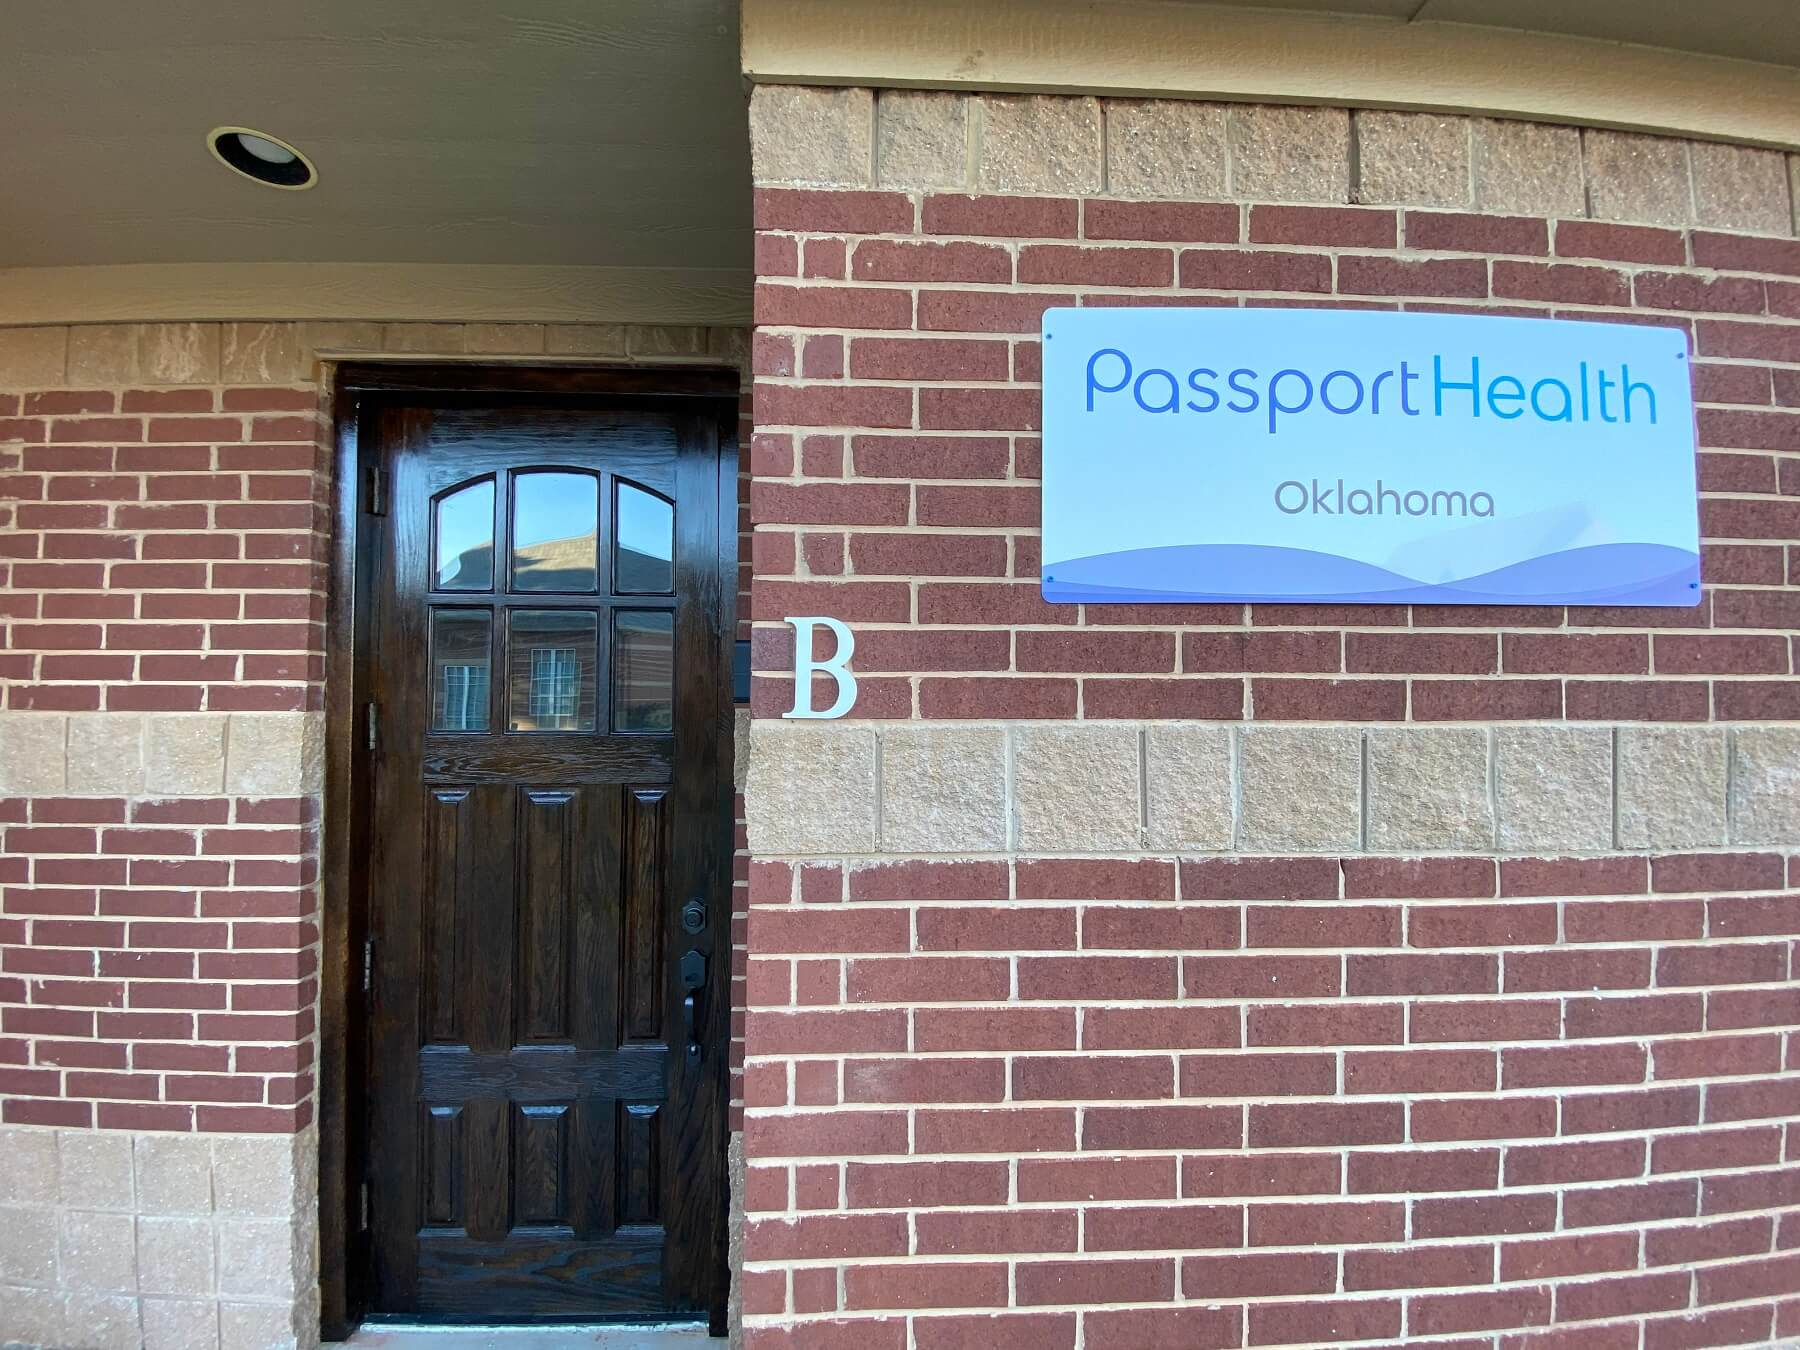 Passport Health Edmond Oklahoma building entrance